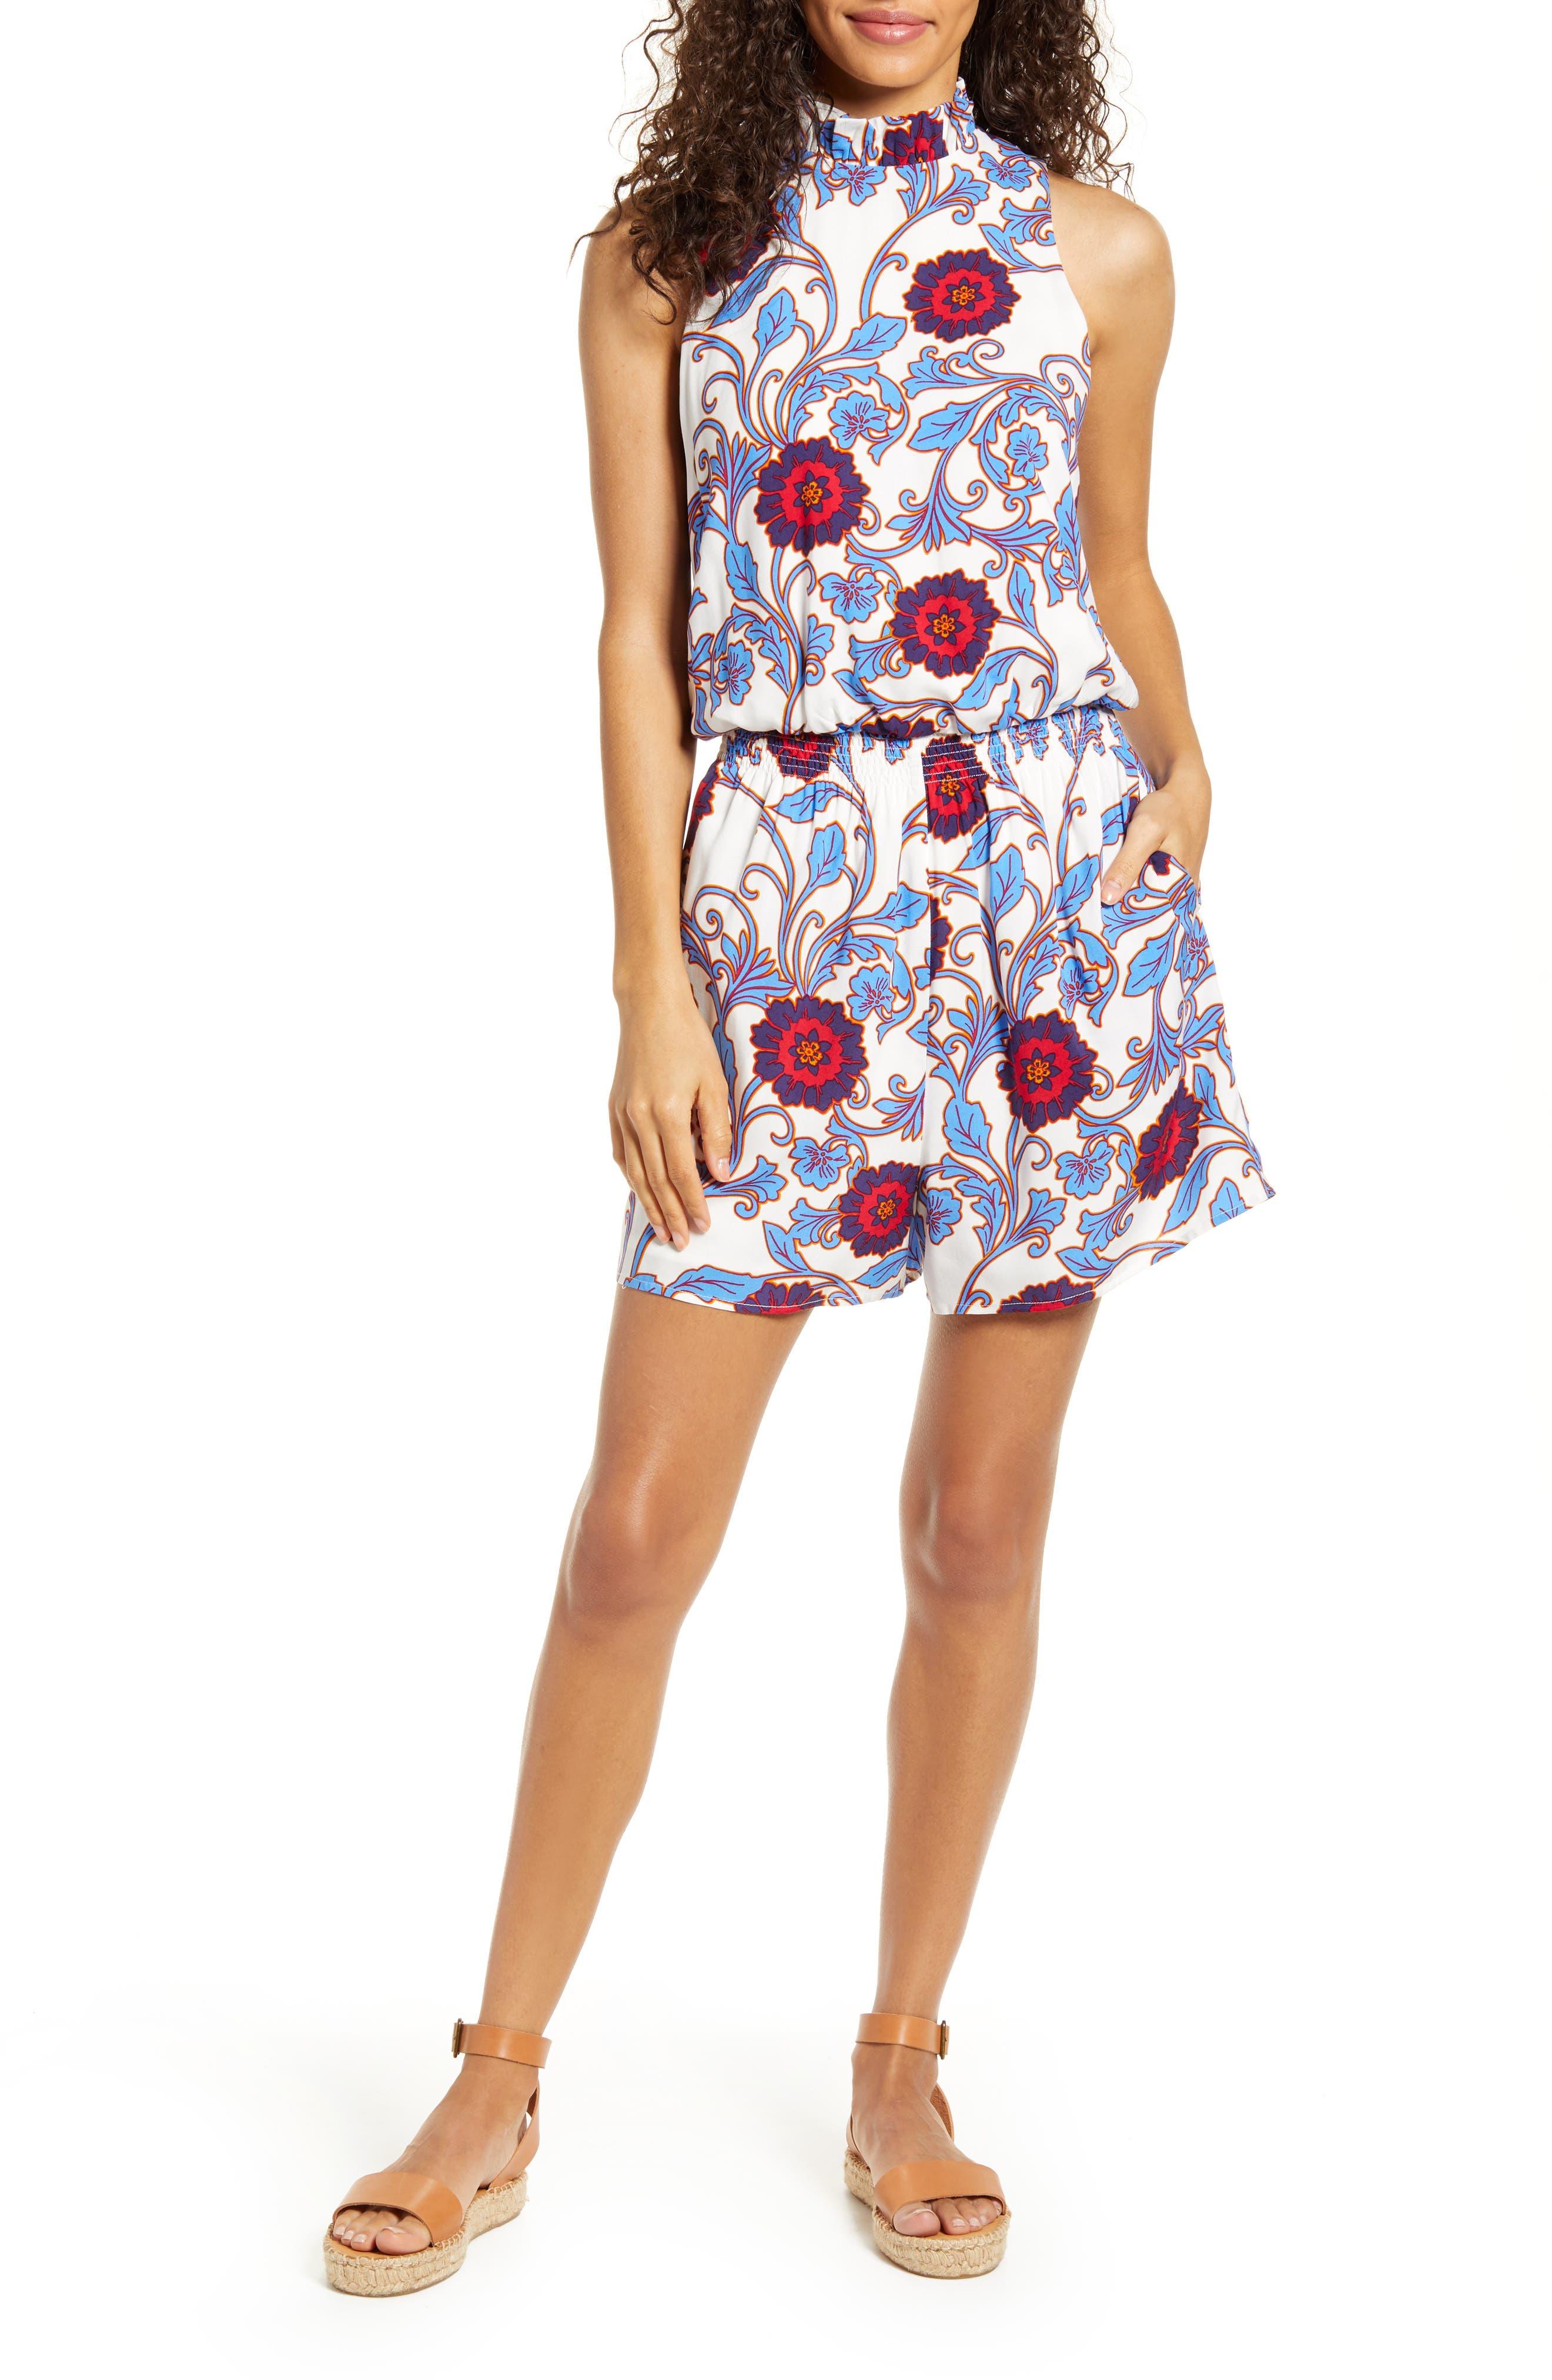 70s Shorts | Denim, High Rise, Athletic Womens Gibson X Hi Sugarplum Capri Smocked Waist Romper $78.00 AT vintagedancer.com